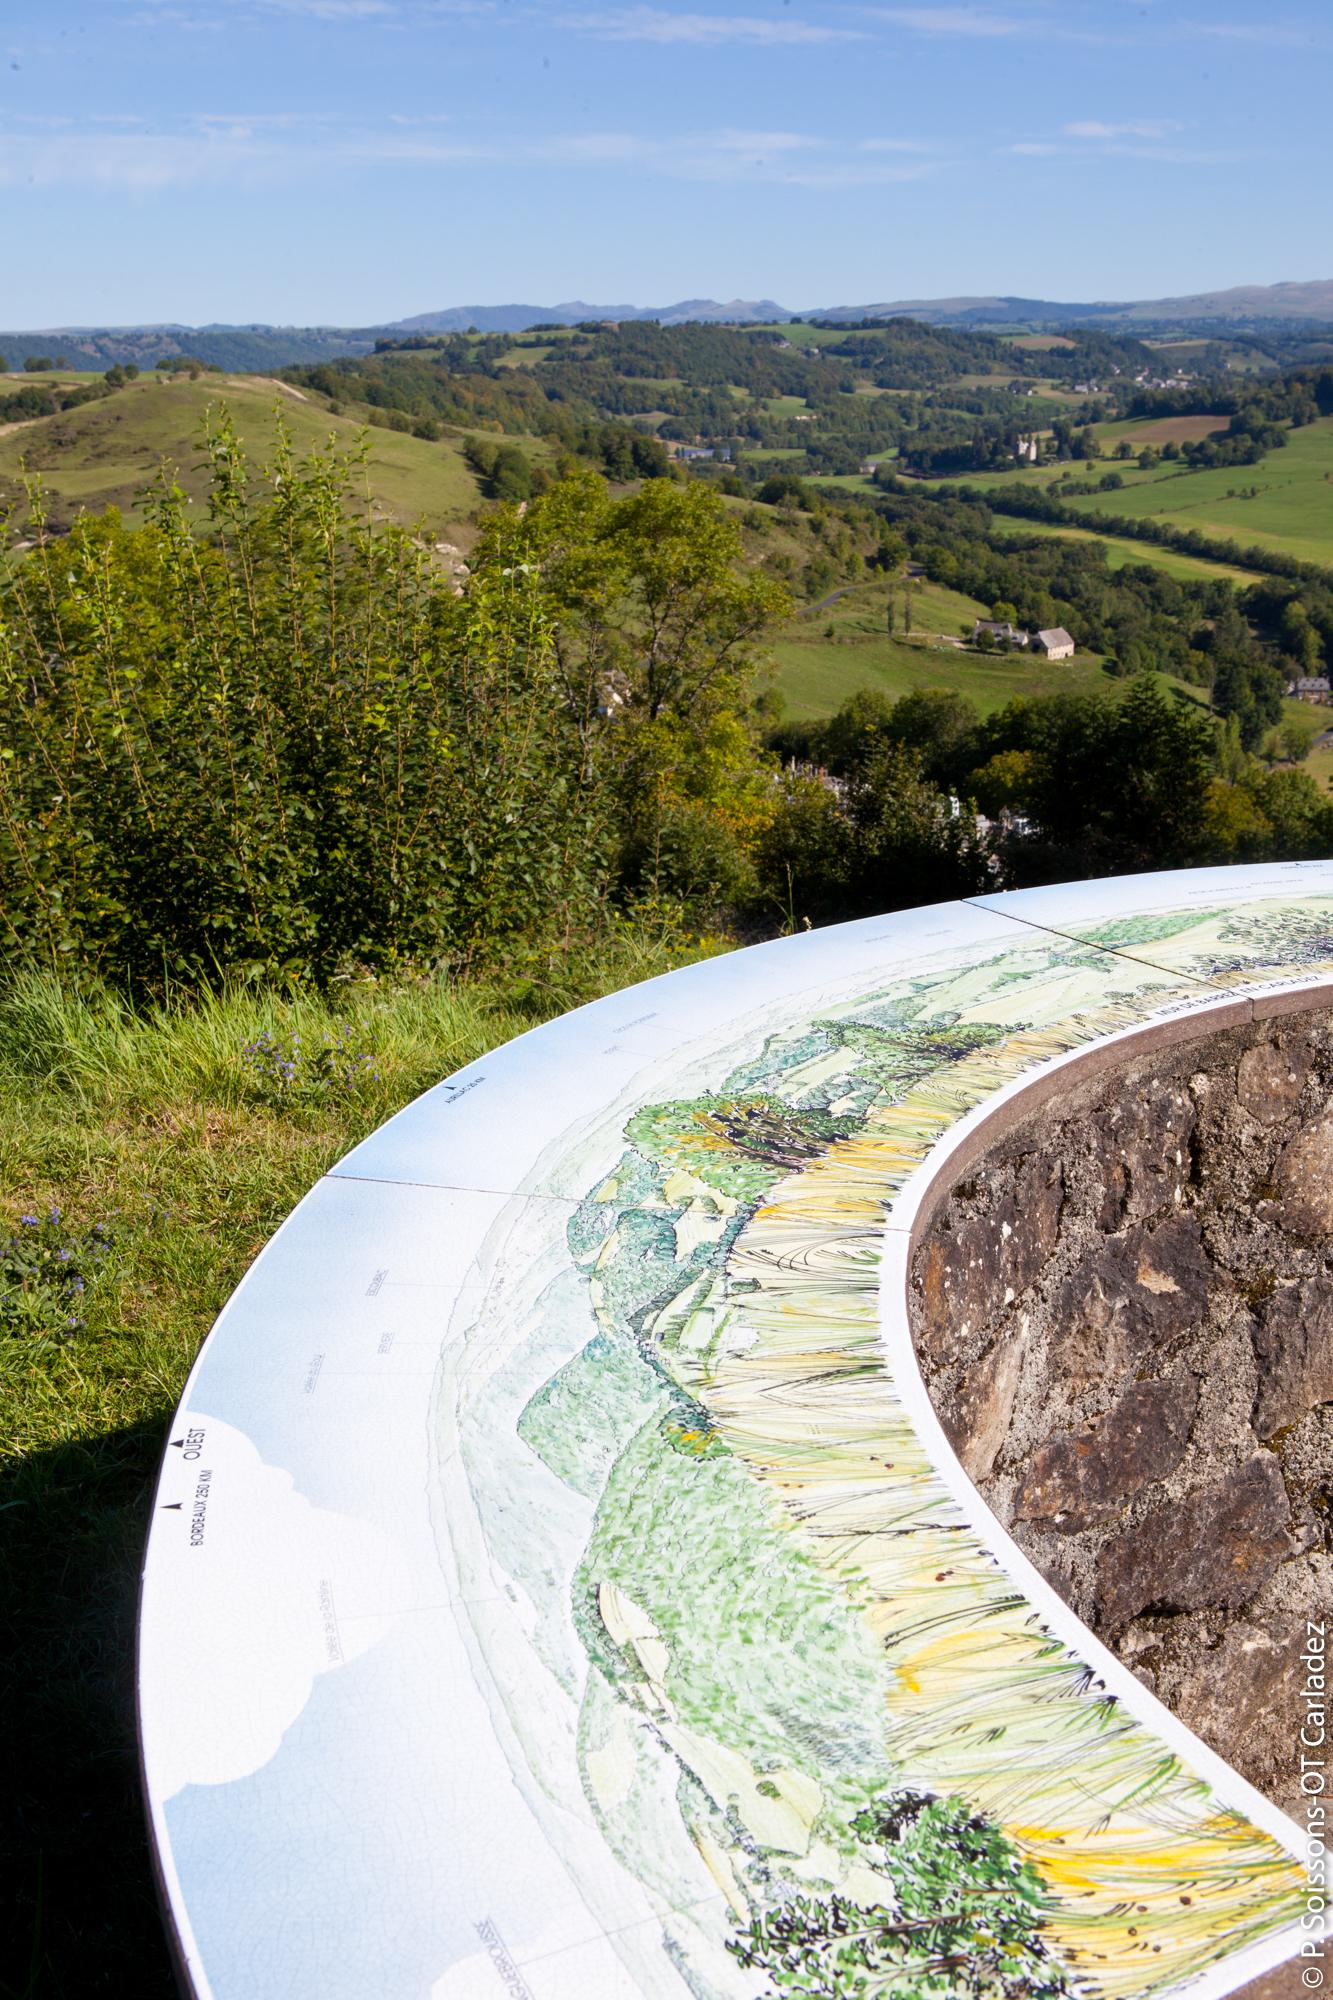 Panorama depuis Mur-de-Barrez, Aveyron